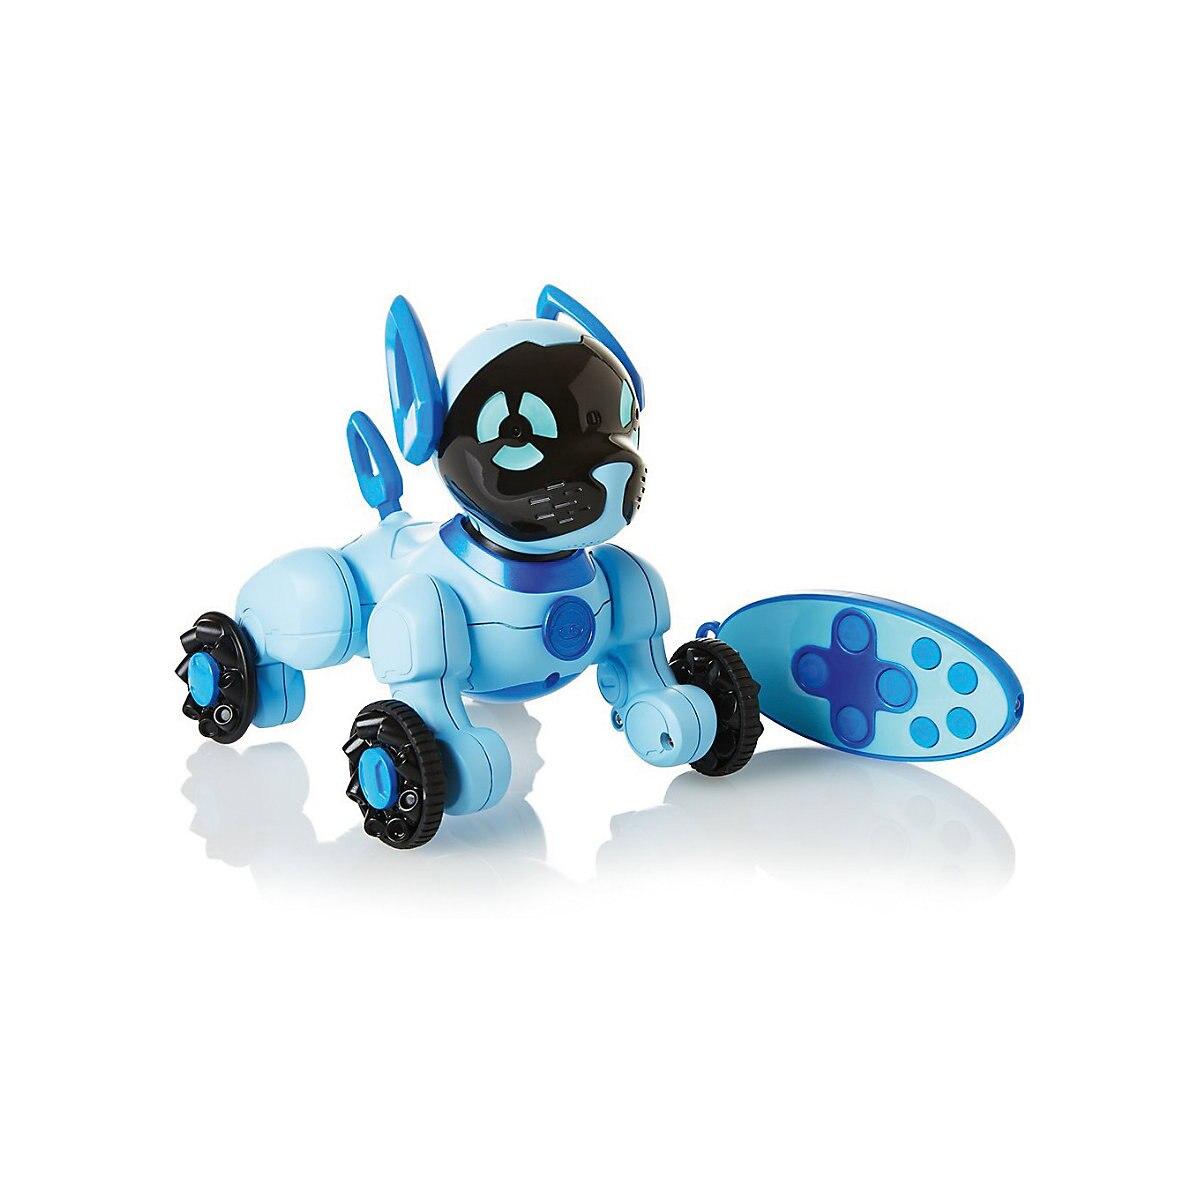 Electronic Pets WowWee 7314003 Tamagochi Robot Toys Interactive Dog Animals Kids MTpromo